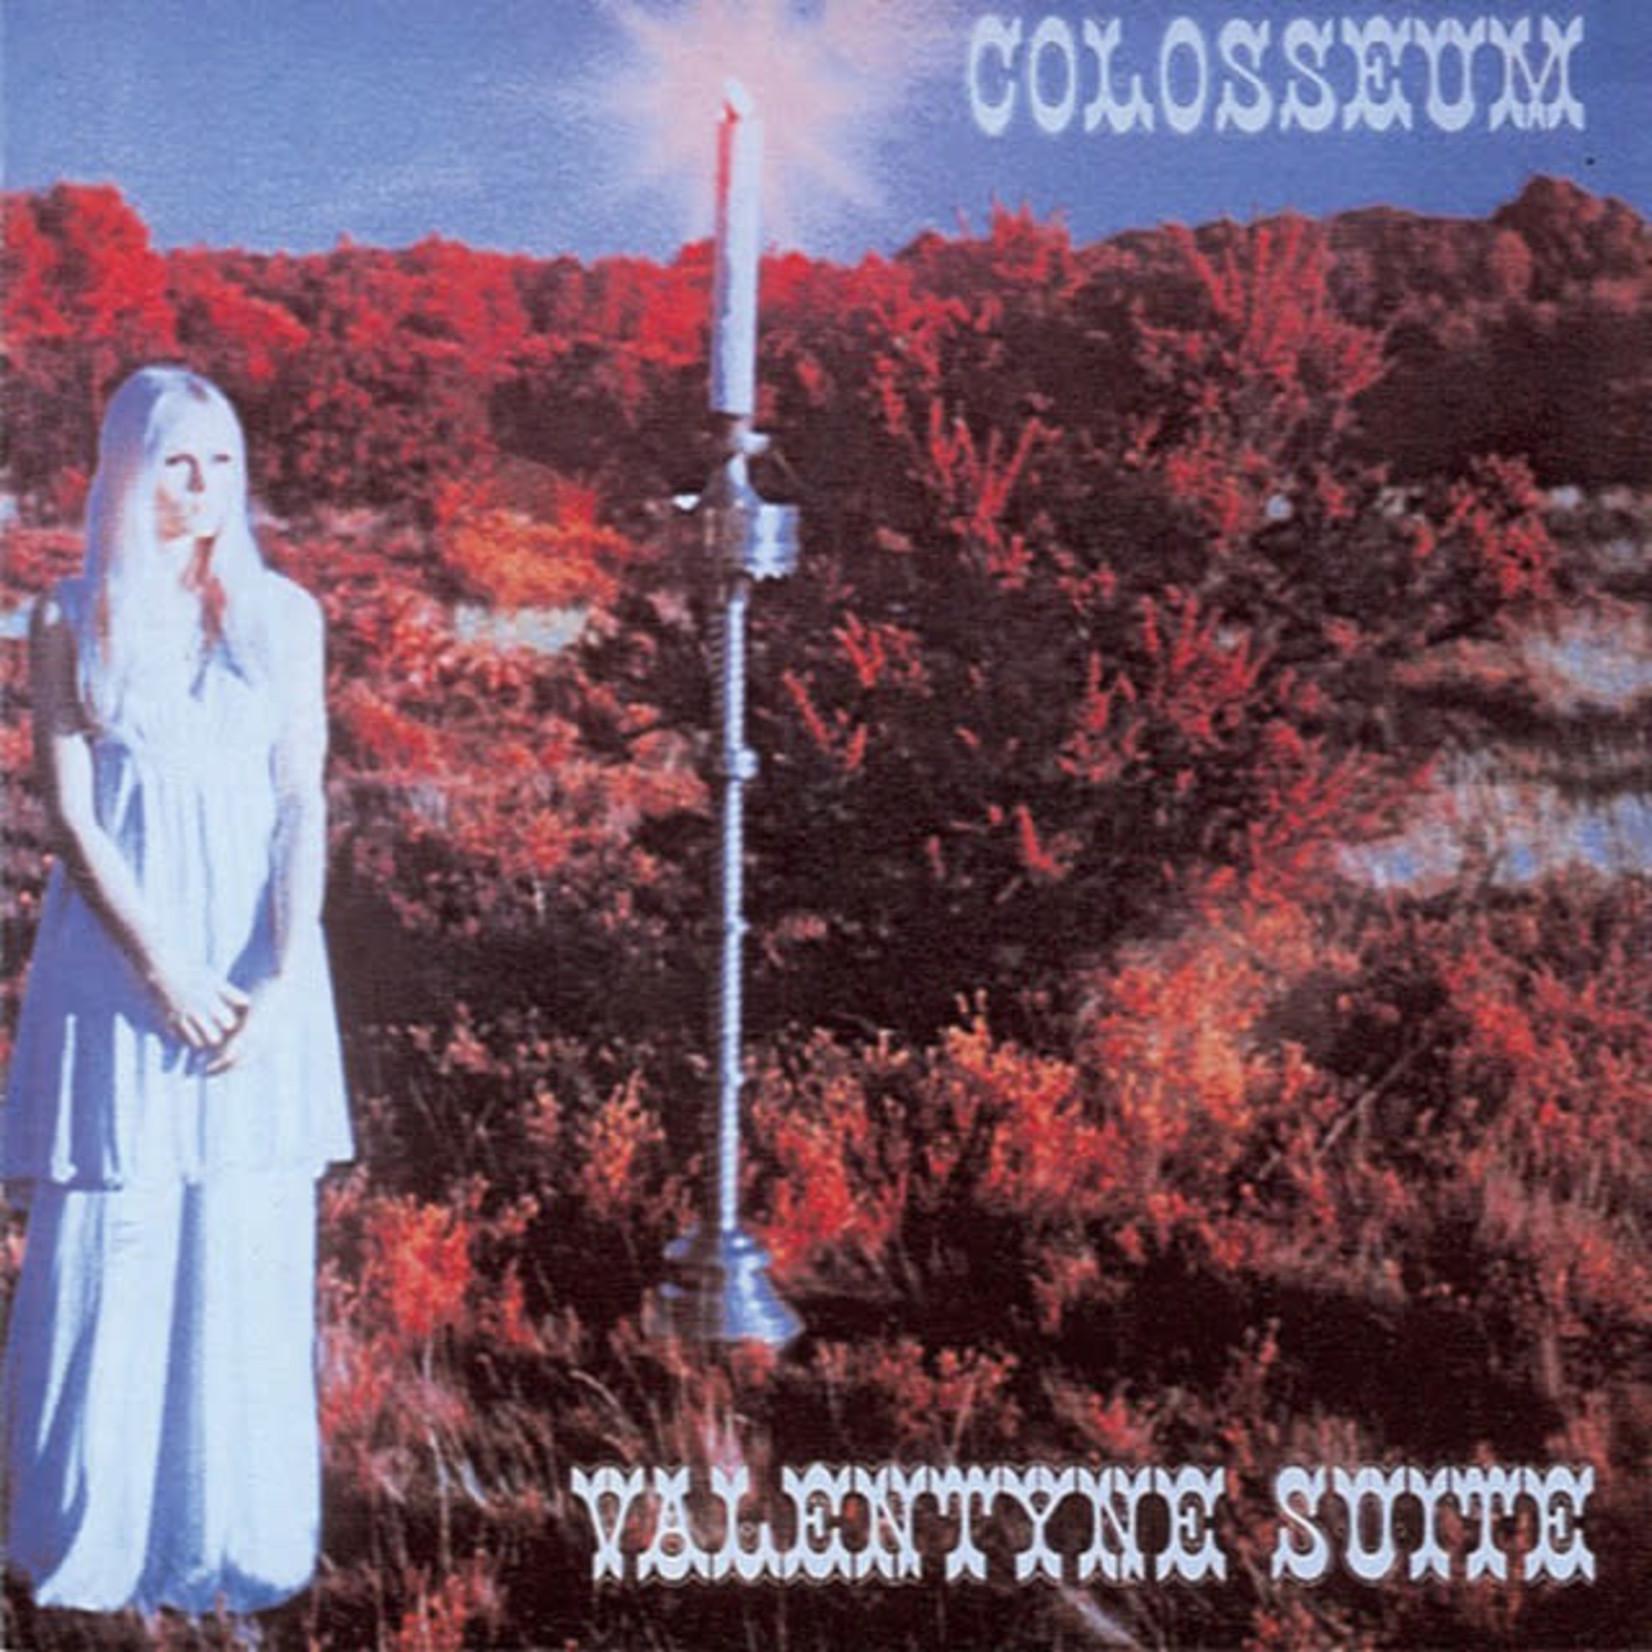 Vinyl Colosseum - Valentyne Suite